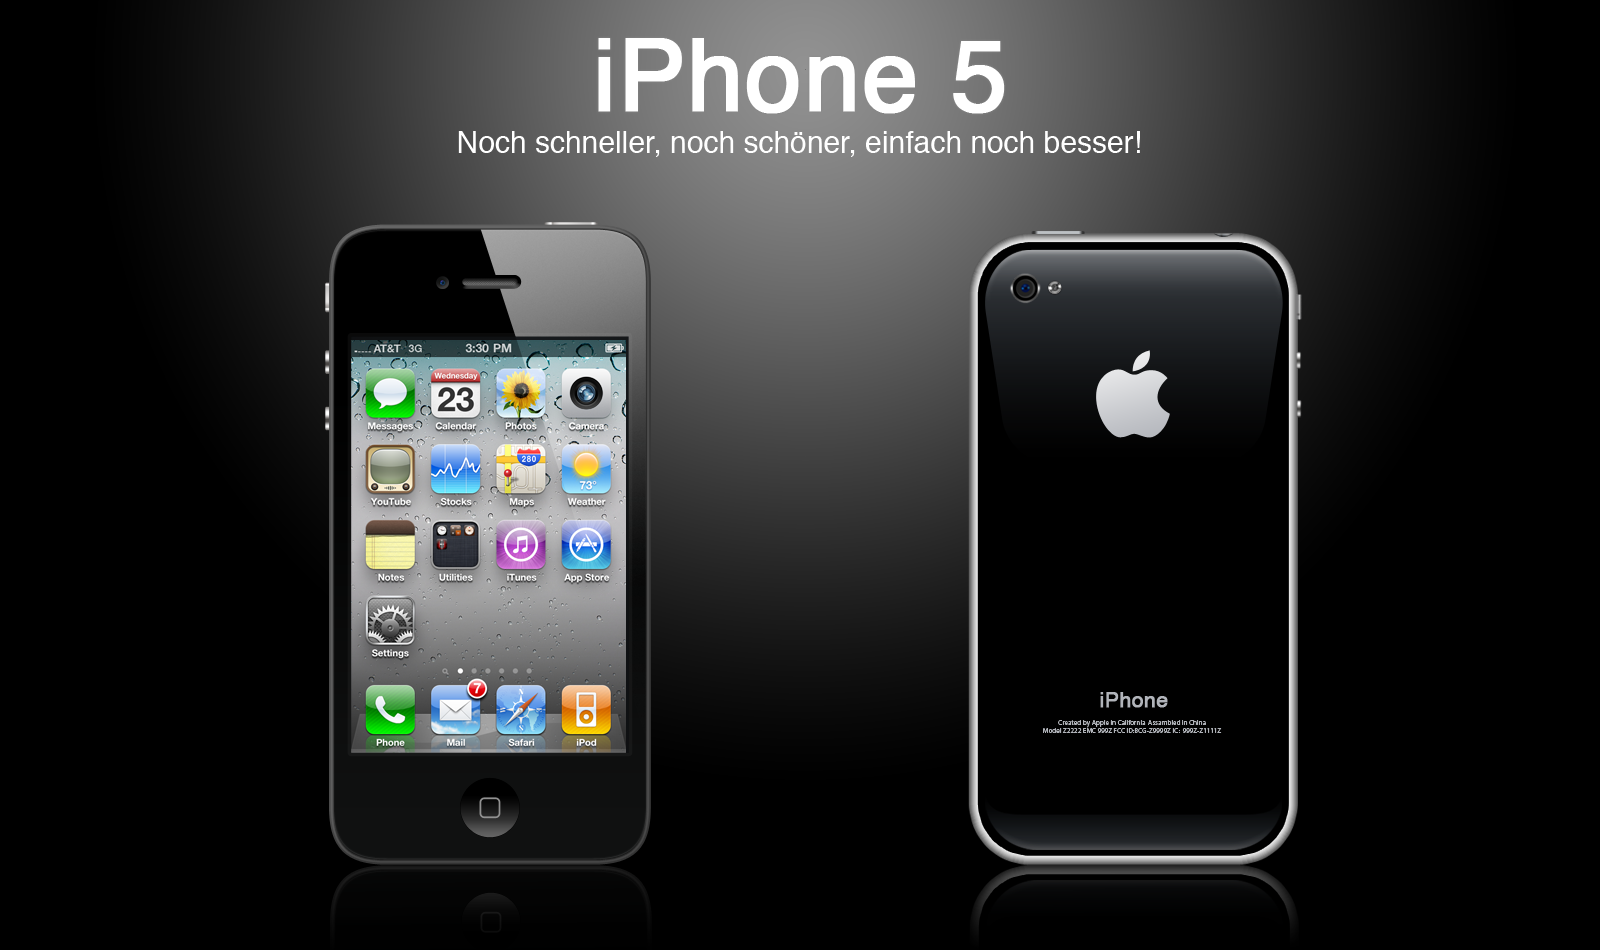 http://1.bp.blogspot.com/-MAUhZ7H1Cek/TZNuKxEGVsI/AAAAAAAAAo0/Z_5lggytxF0/s1600/iPhone_5_concept_image_konzept_Glaswelt_201_2__3_.png